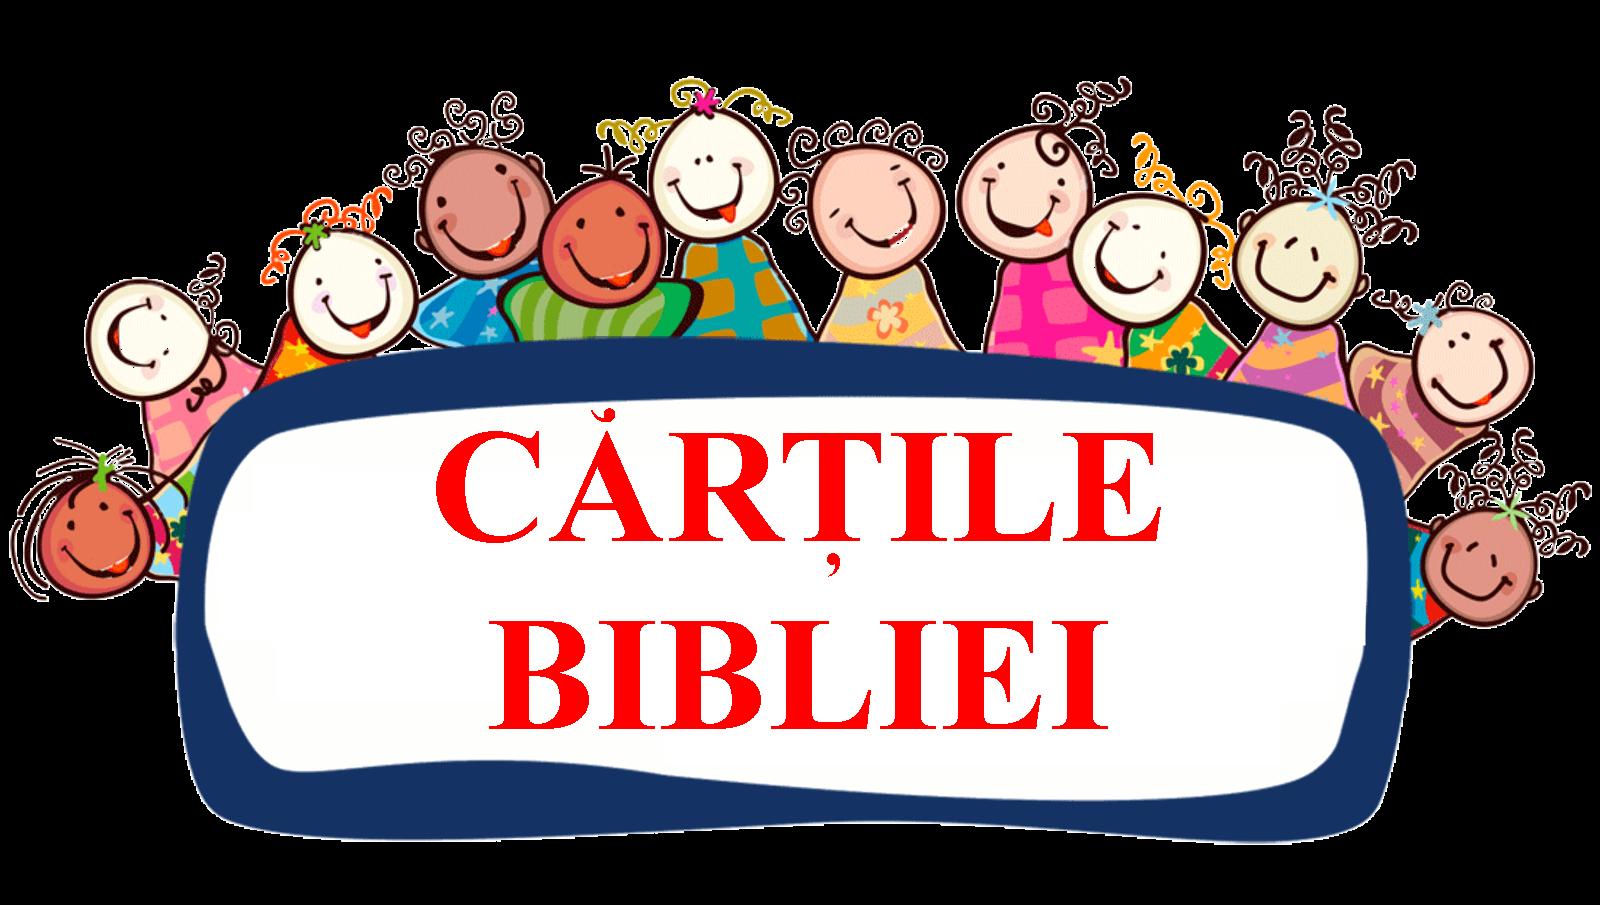 CARTILE BIBLEI